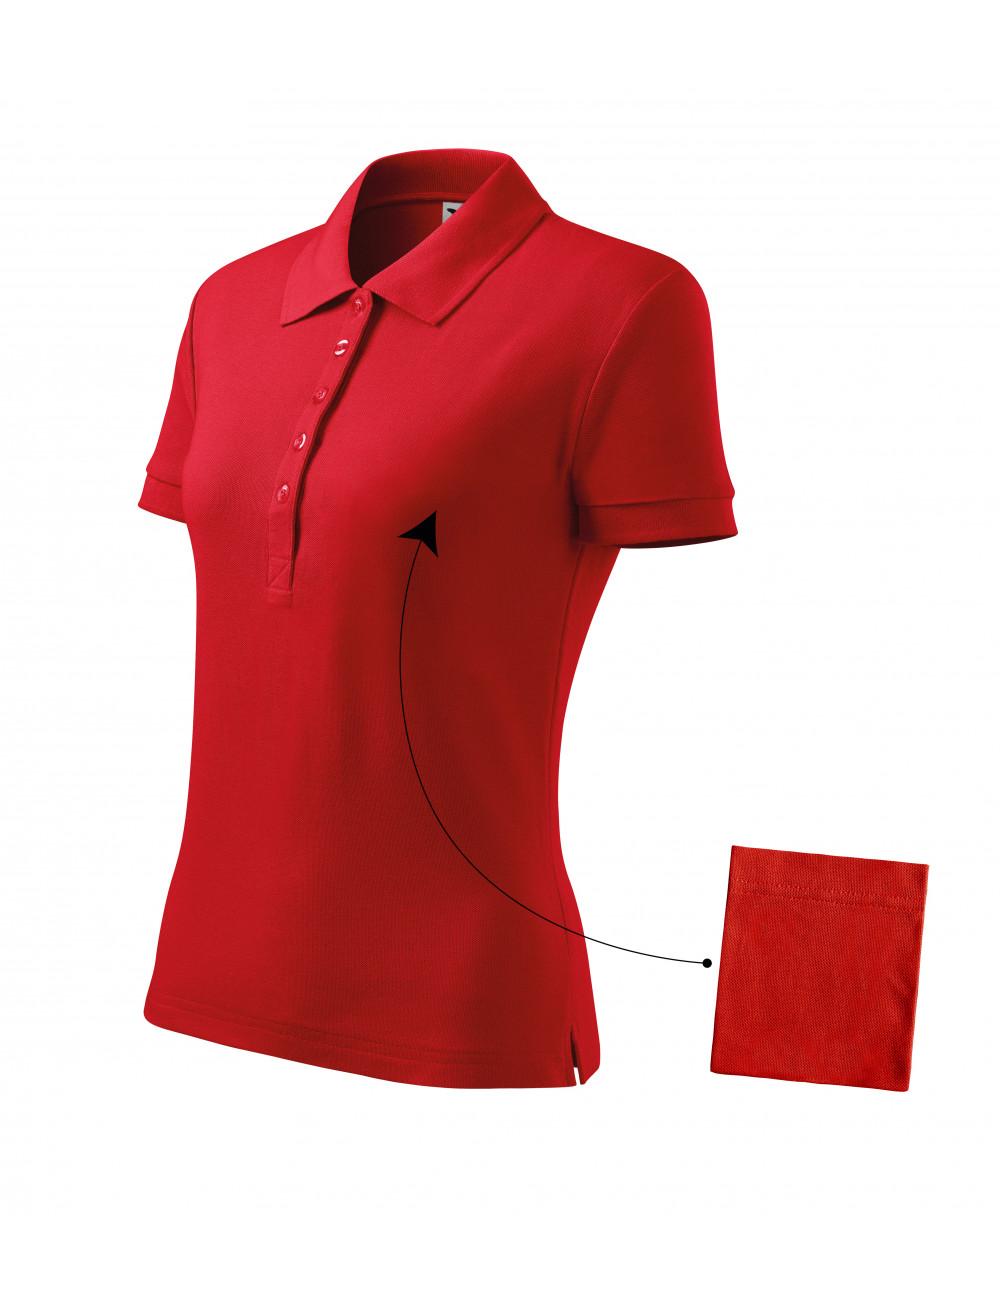 Adler MALFINI Koszulka polo damska Cotton 213 czerwony